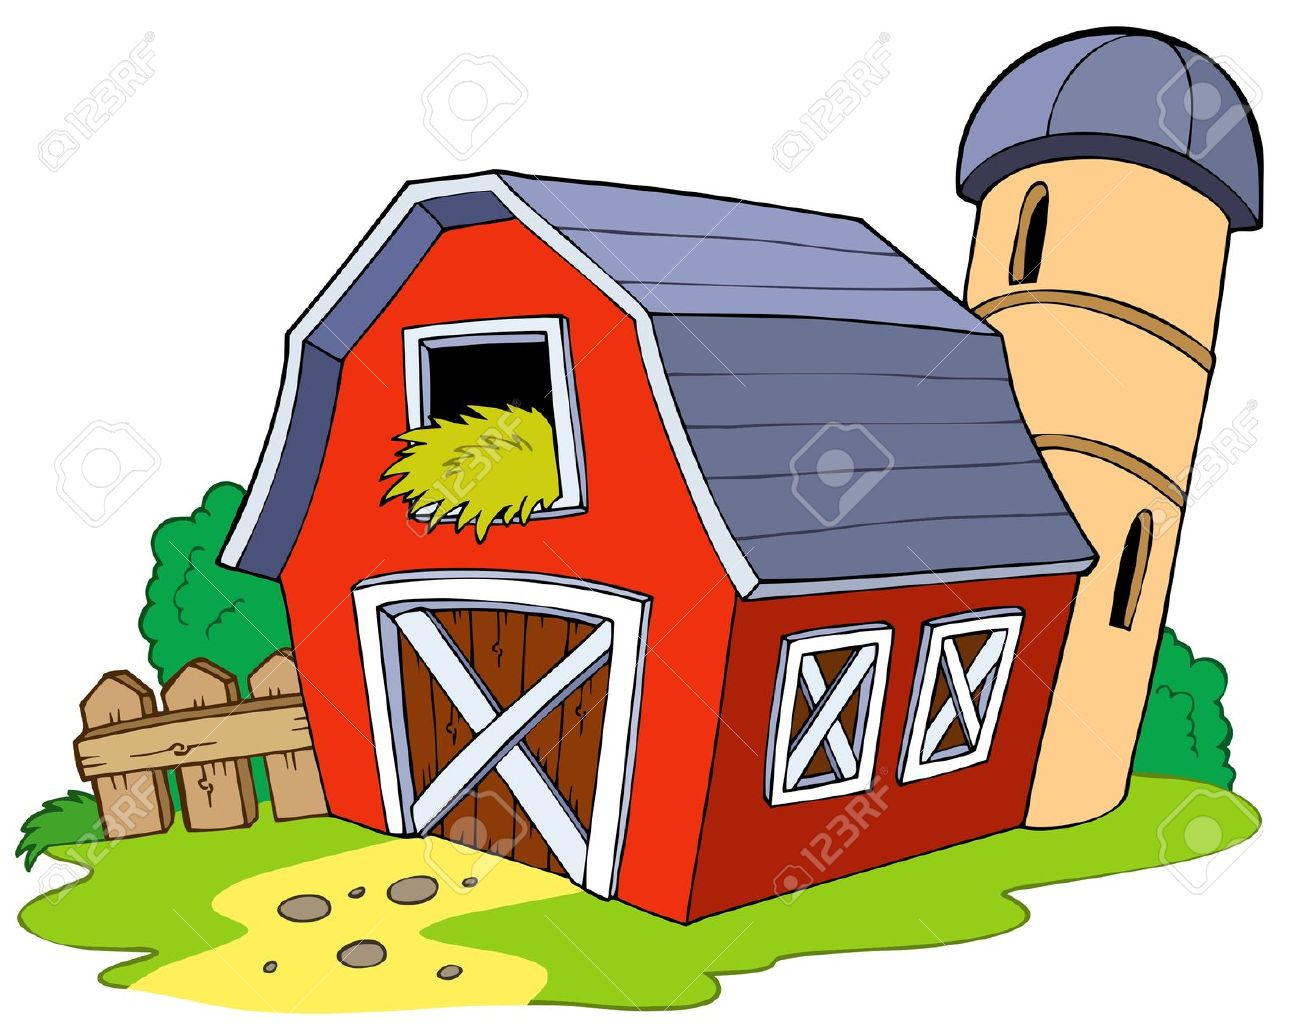 C:\Users\Таня\Desktop\картинки проекта\7630265-Cartoon-red-barn-Stock-Vector-farm.jpg